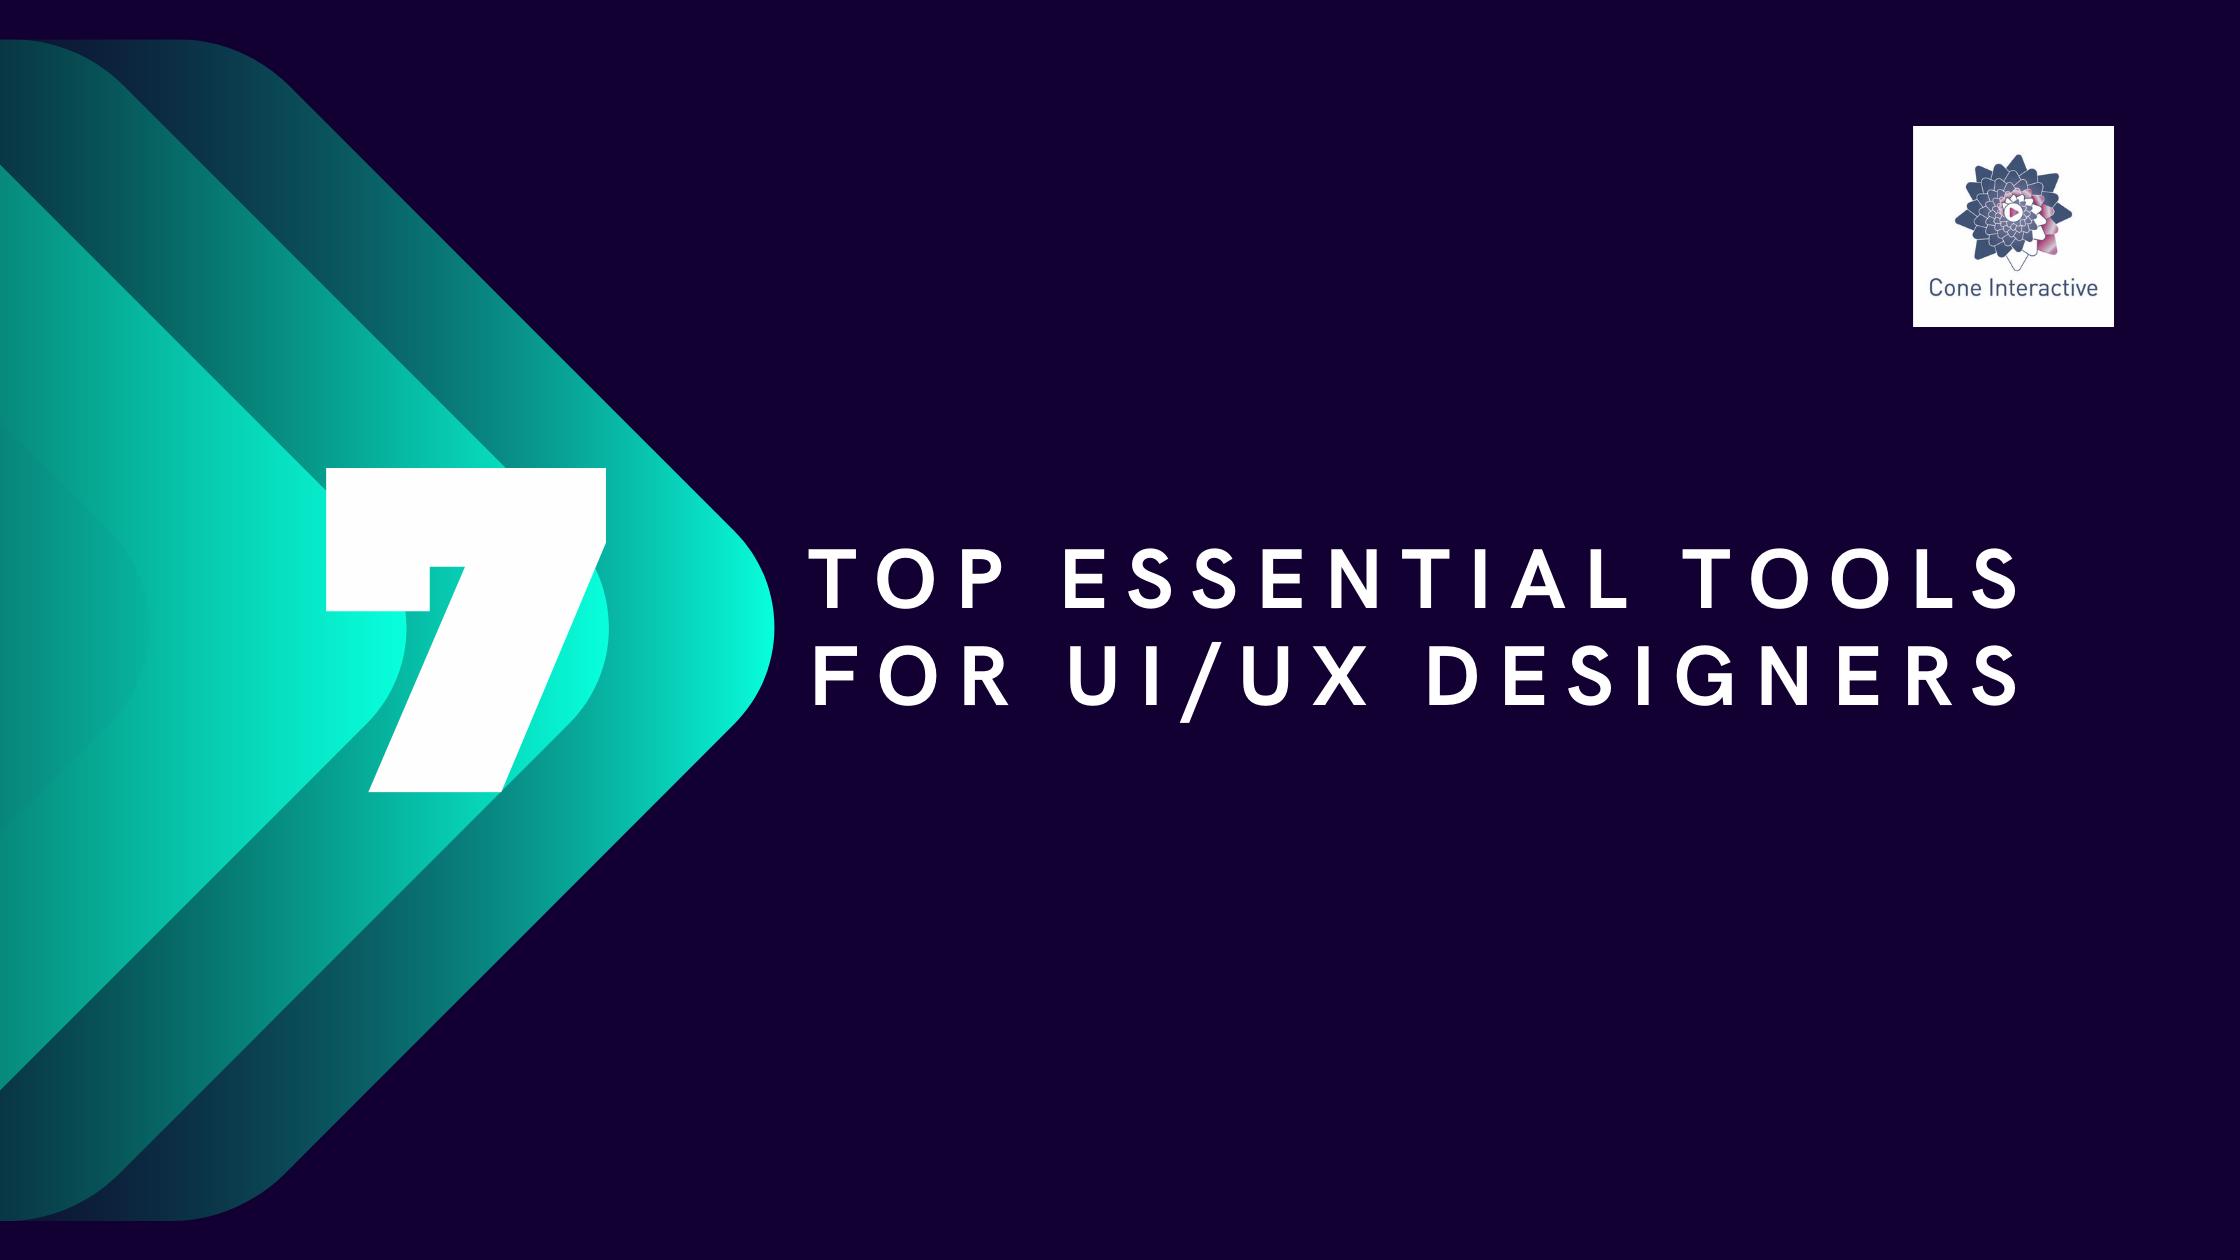 tools for UI/UX designers